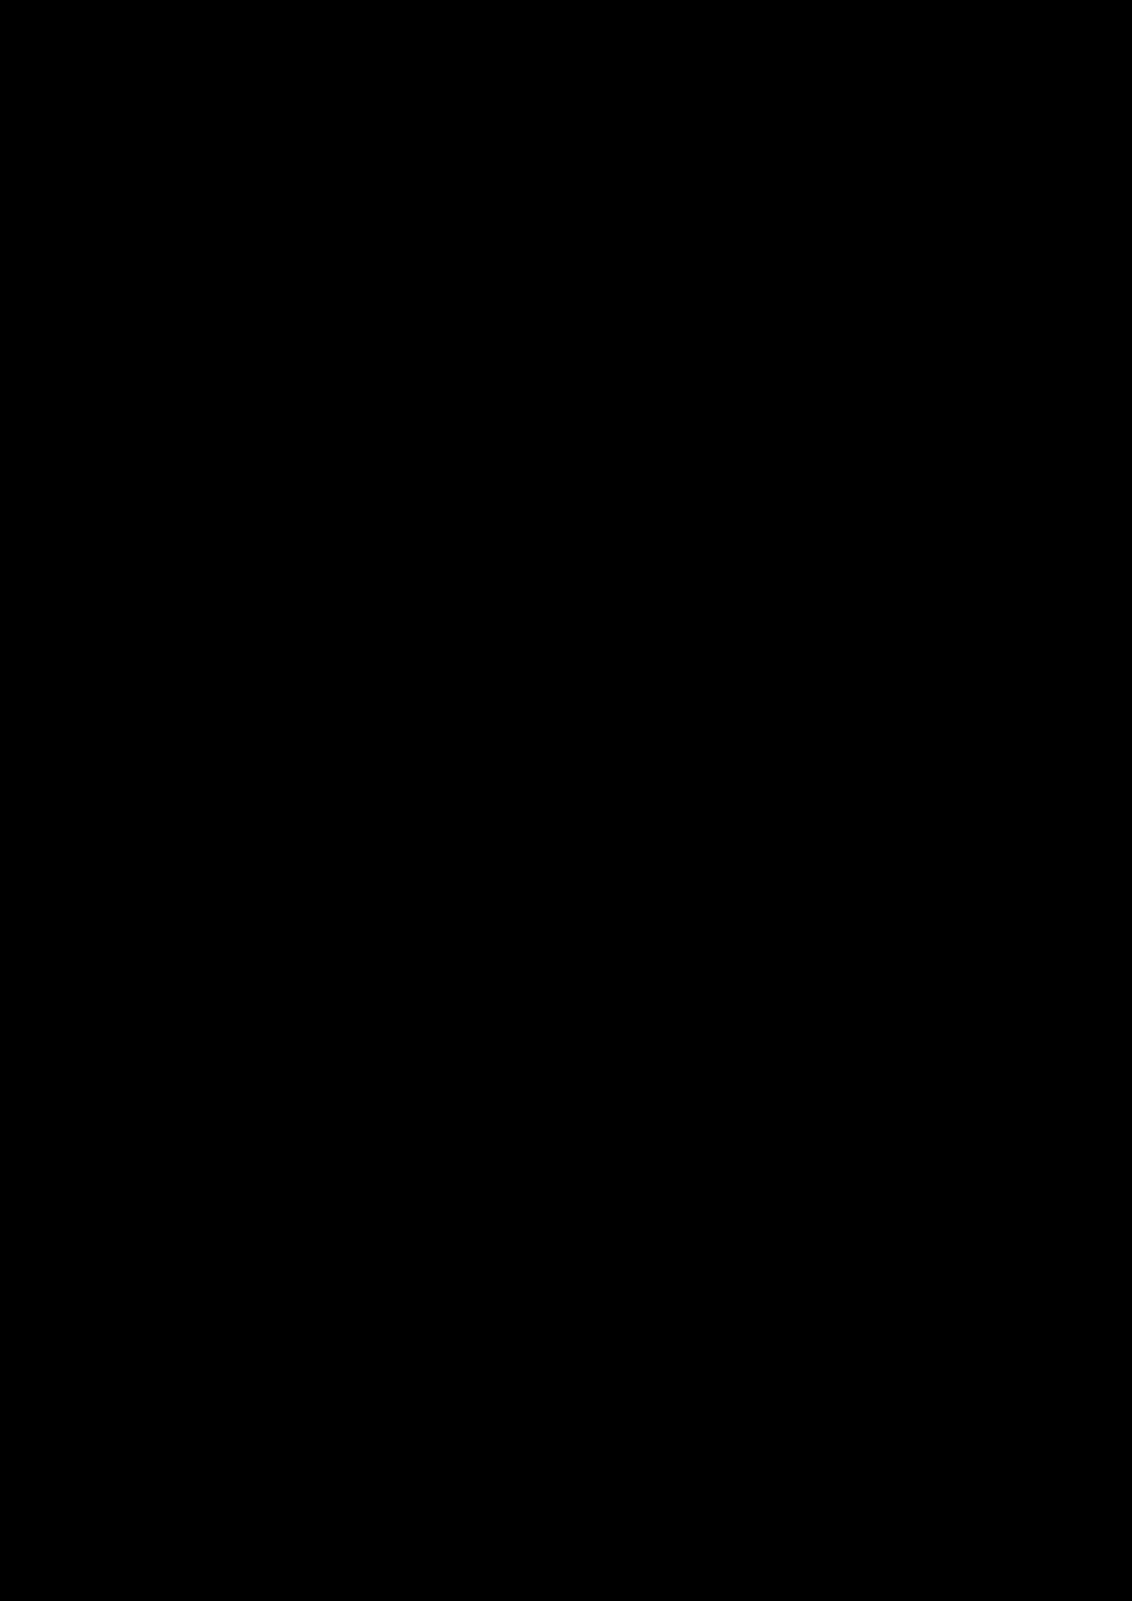 Prosti slide, Image 22